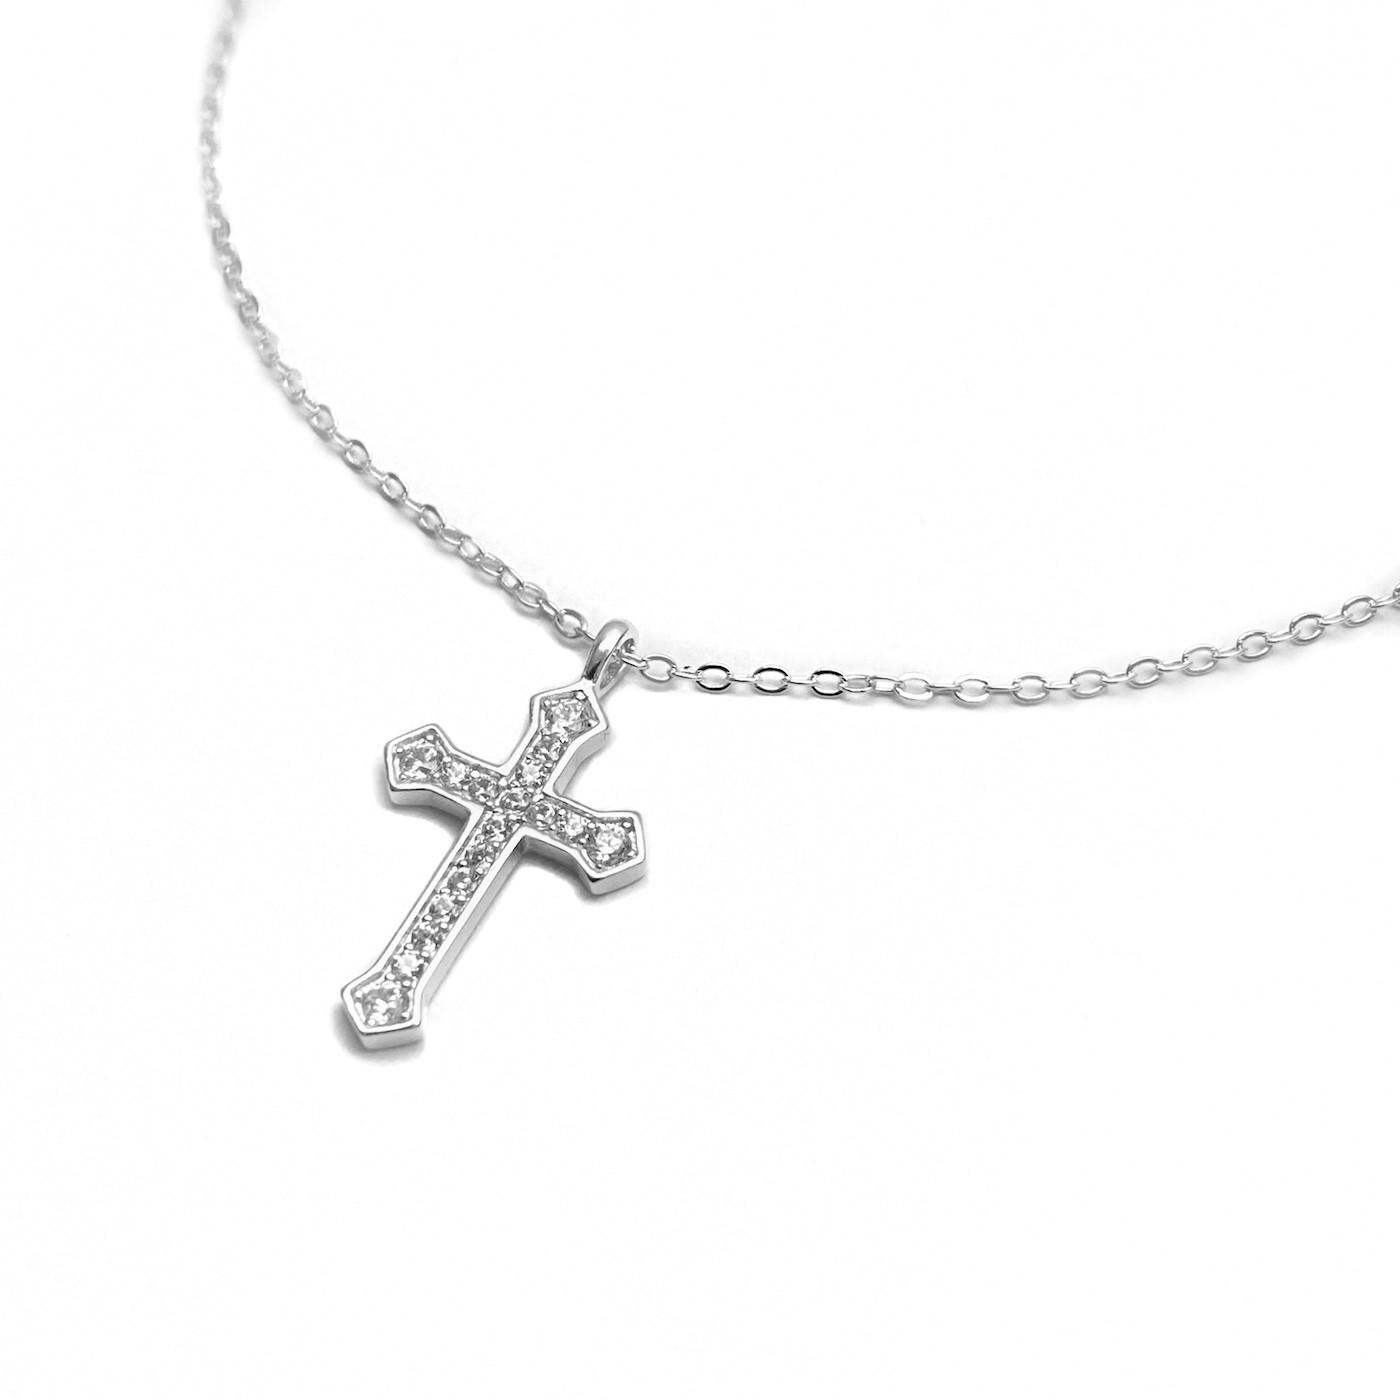 Conjunto Crucifixo Cravejado 2mm X 11mm  + Carrier 42cm (Prata 925 Italiana)